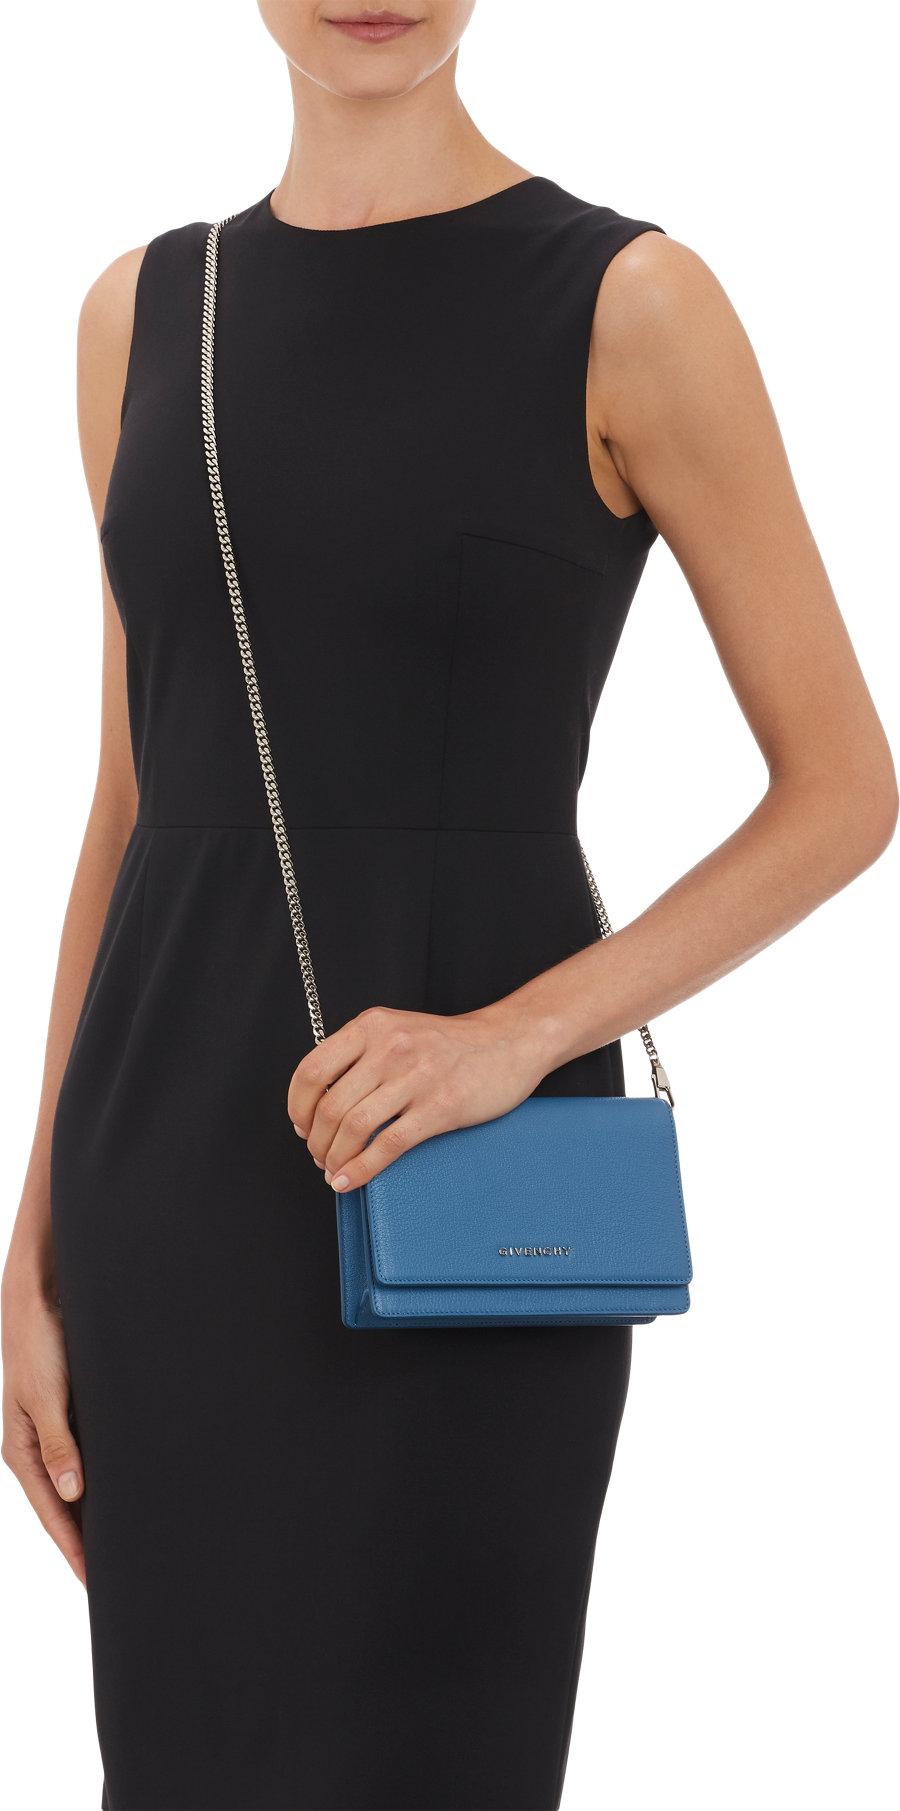 b7d797e4da Givenchy Pandora Chain-Strap Wallet in Blue - Lyst